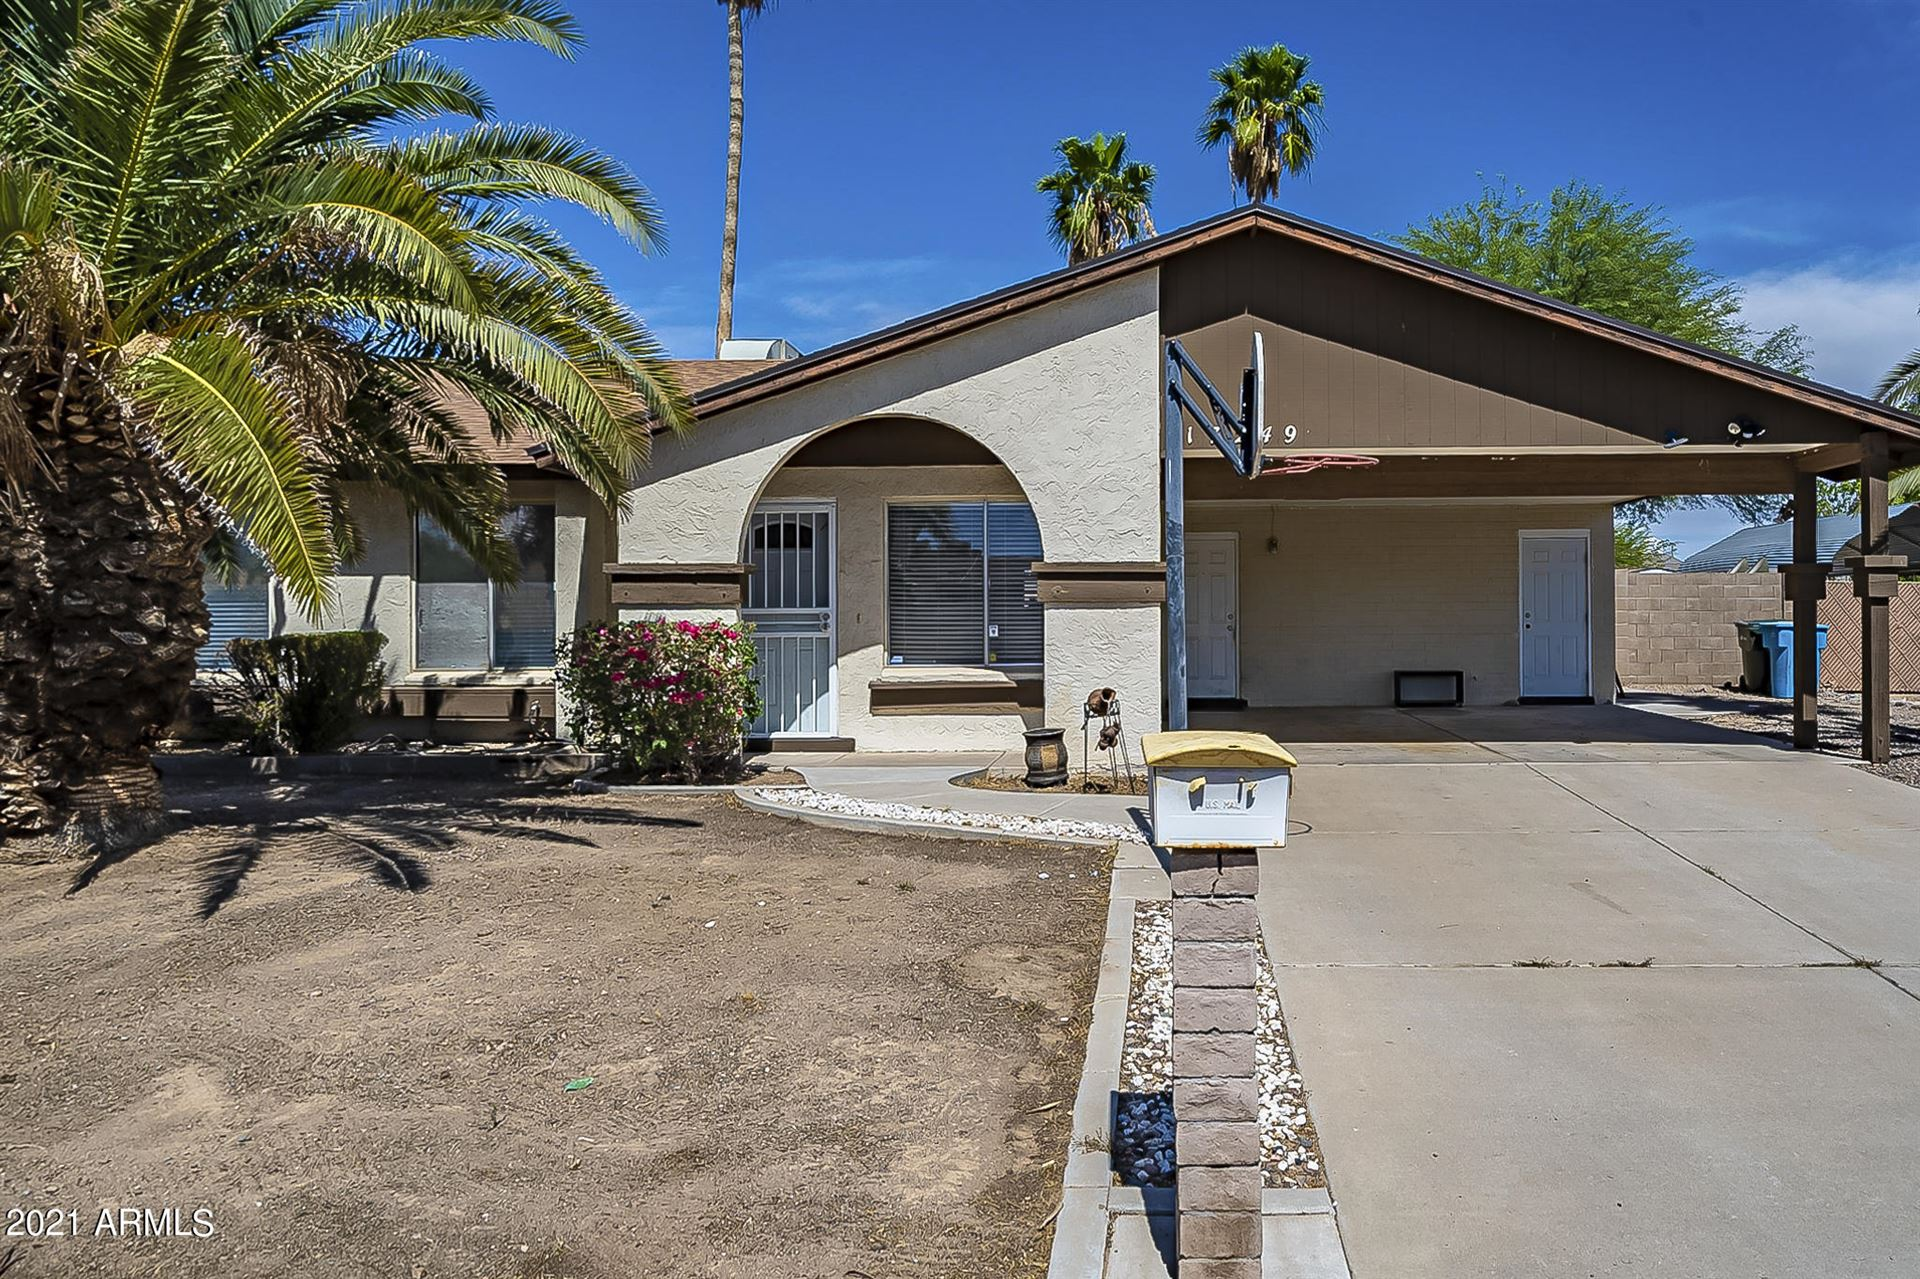 17249 N 29TH Avenue, Phoenix, AZ 85053 - MLS#: 6247688